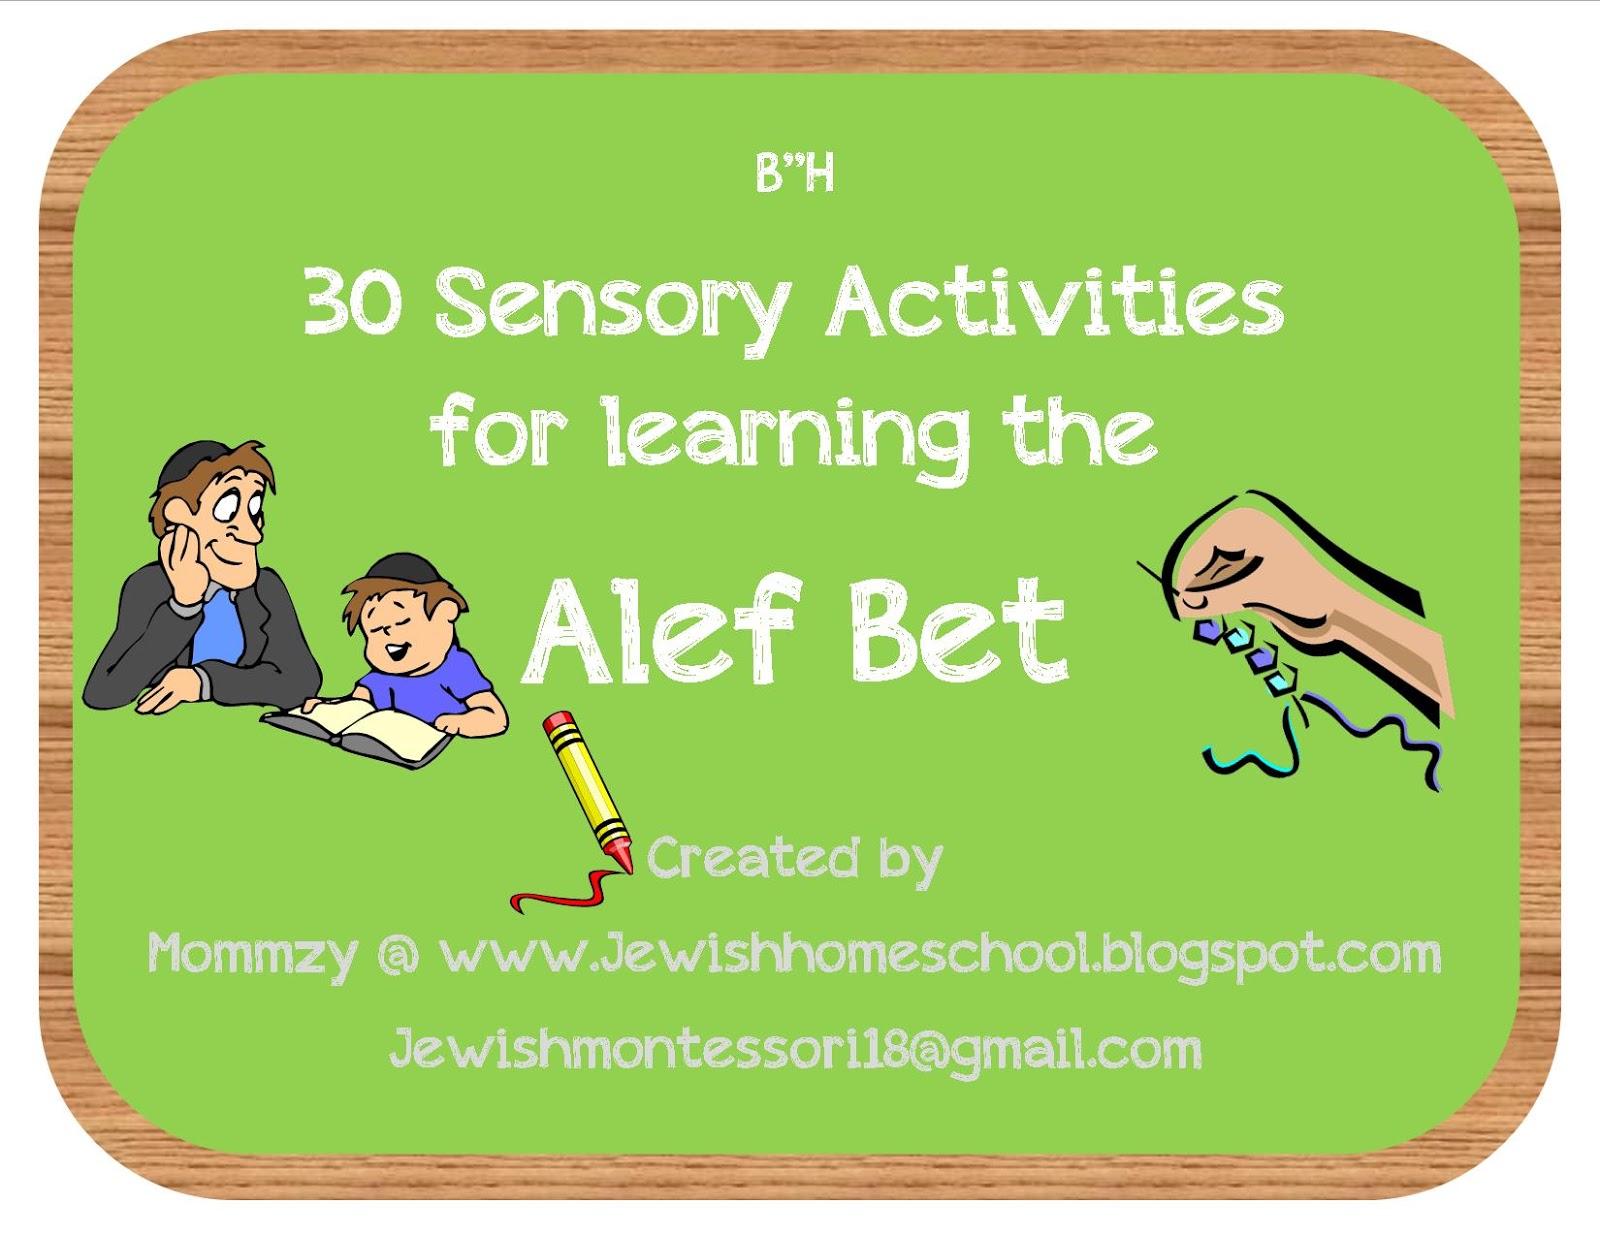 A Jewish Homeschool Blog 30 Sensory Activities For